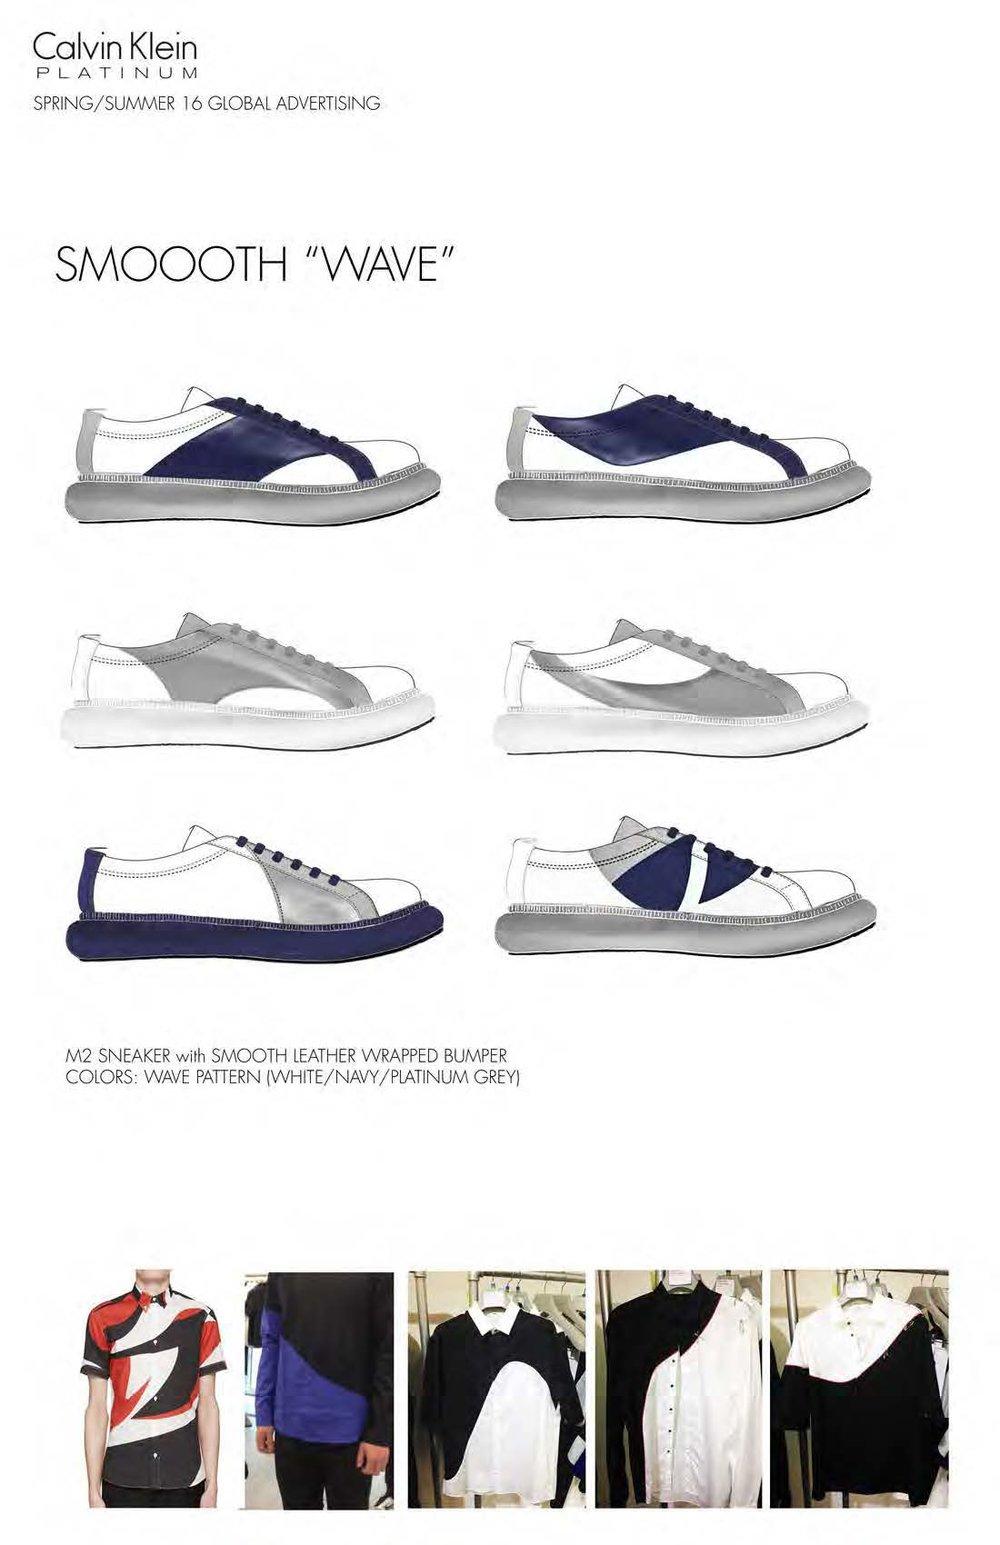 7.KGRESS Portfolio-SS16 CKP AD Footwear_Page_11.jpg